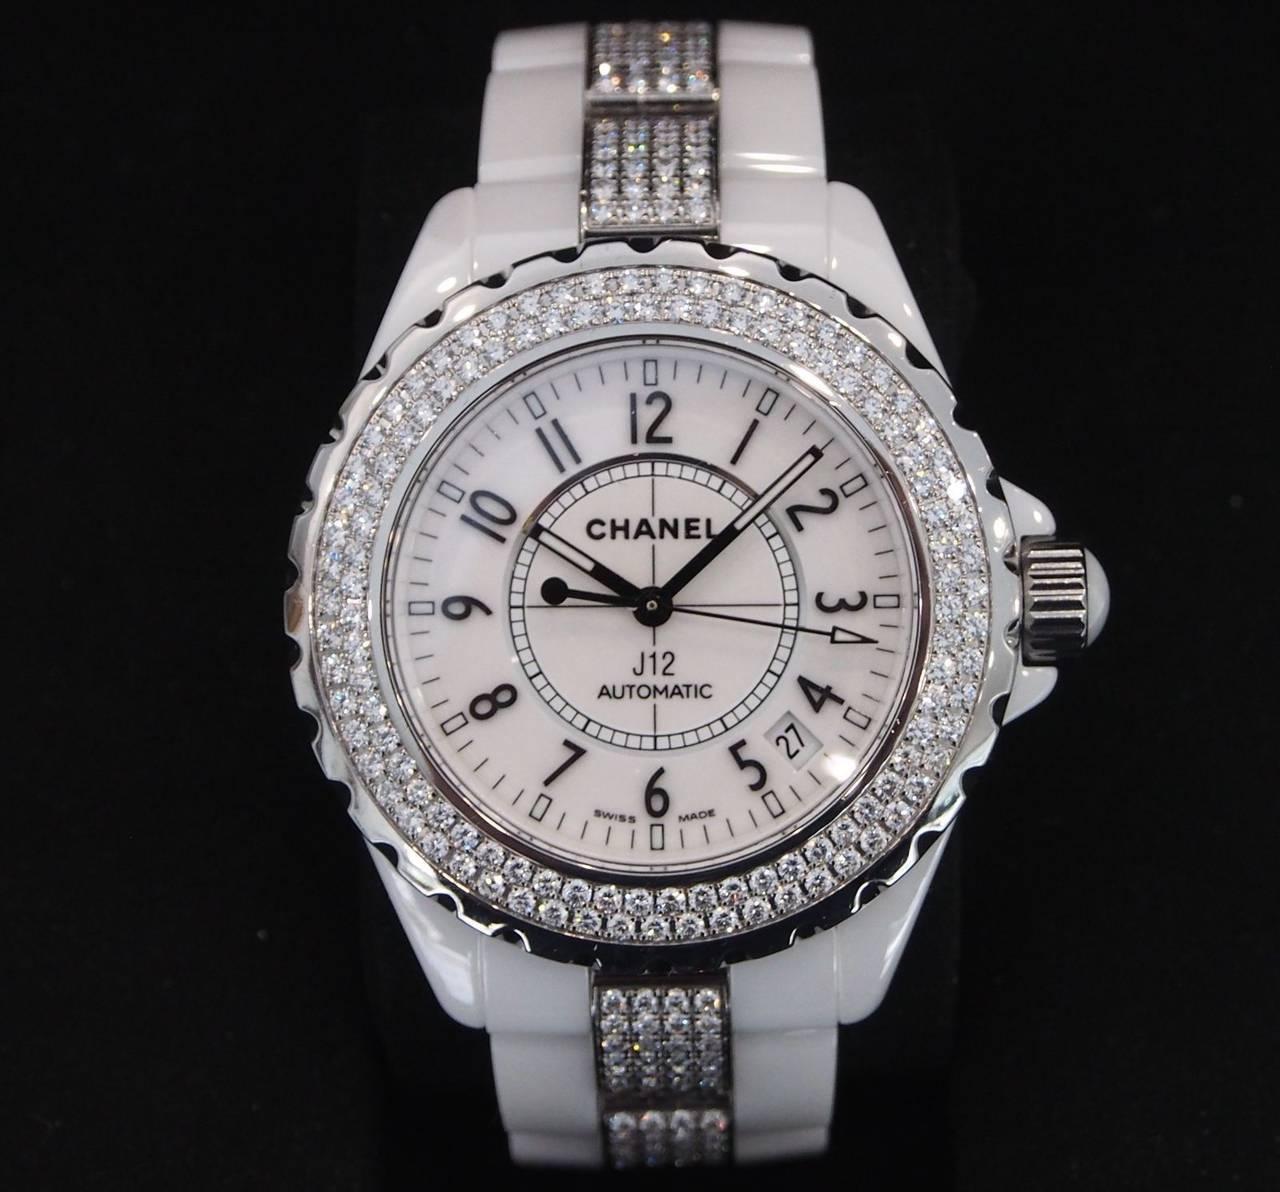 6f68dac5fcc CHANEL--- J12 38mm White Ceramic w  Diamond Bezel and Bracelet H1422 at  1stdibs